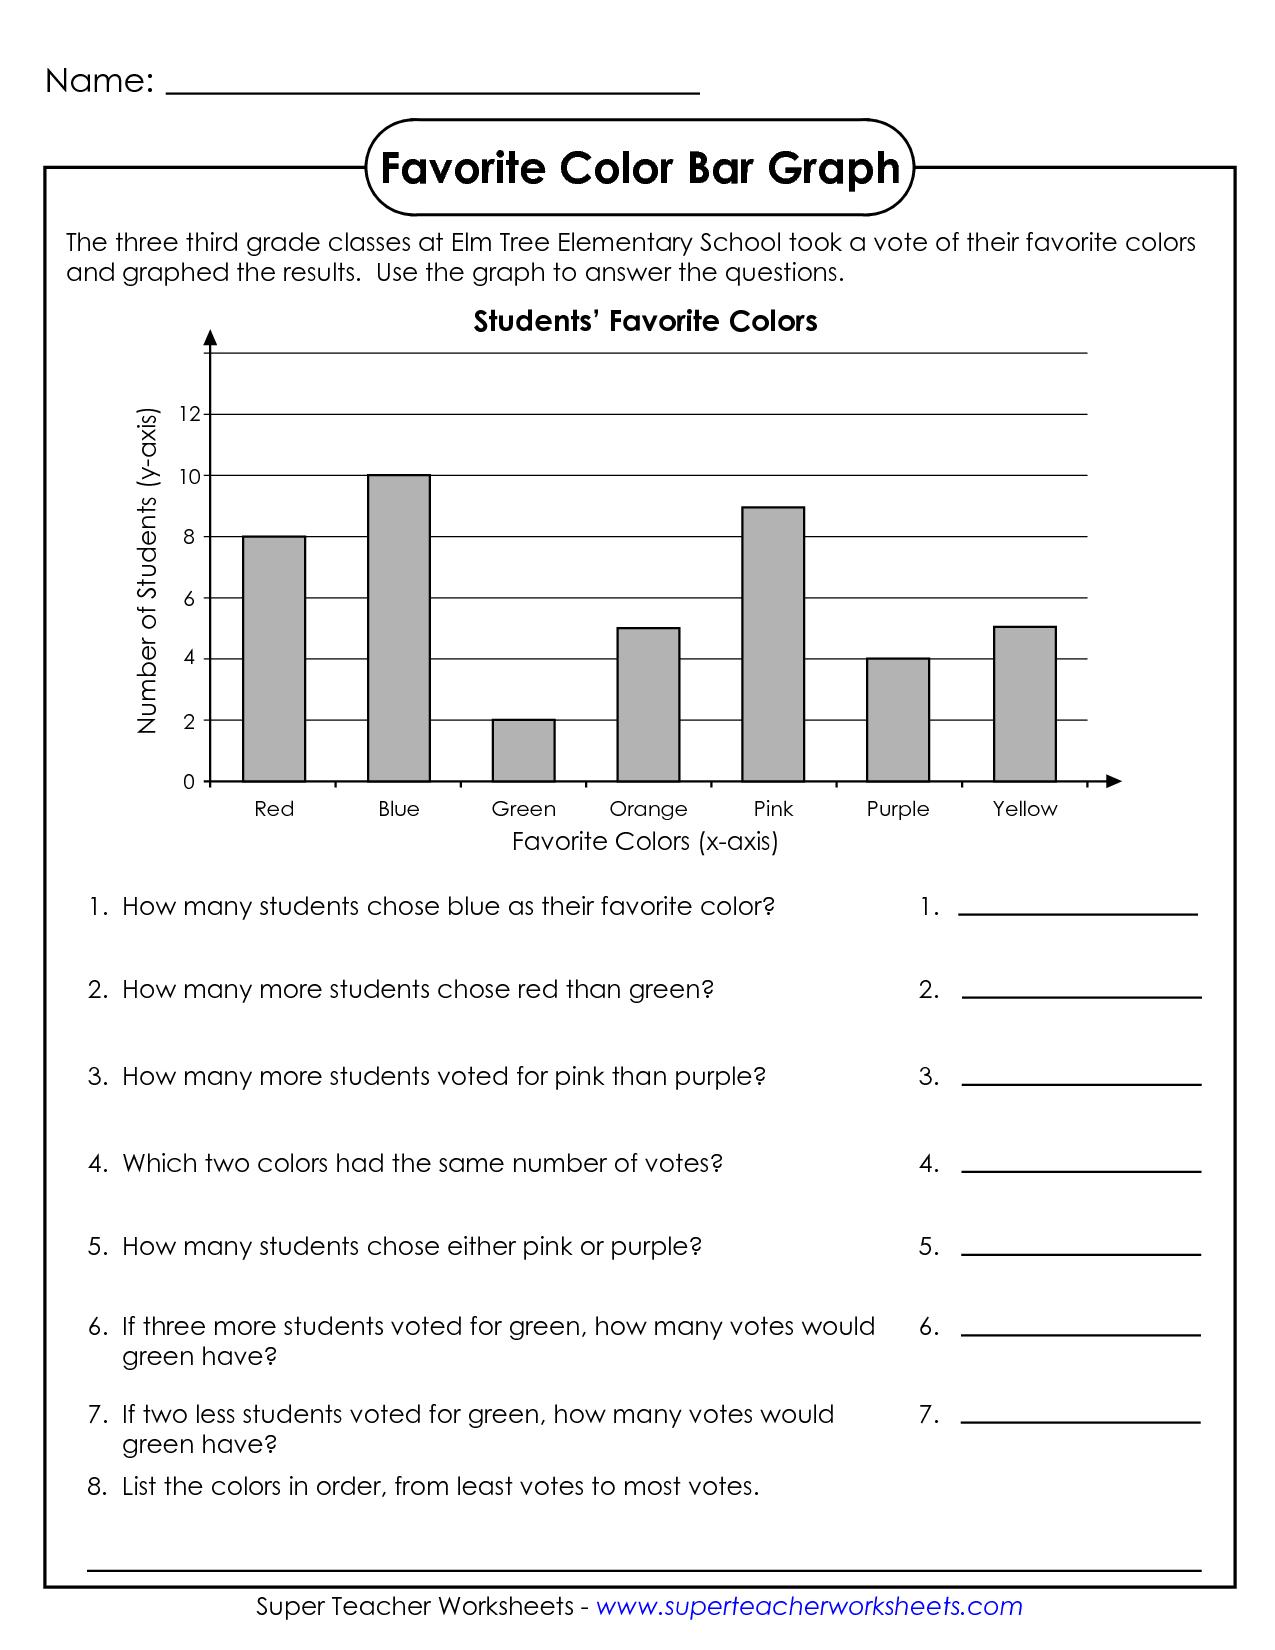 Comprehension Worksheets for Grade 1 Free and Math Worksheets for 3rd Graders Name Favorite Color Bar Graph